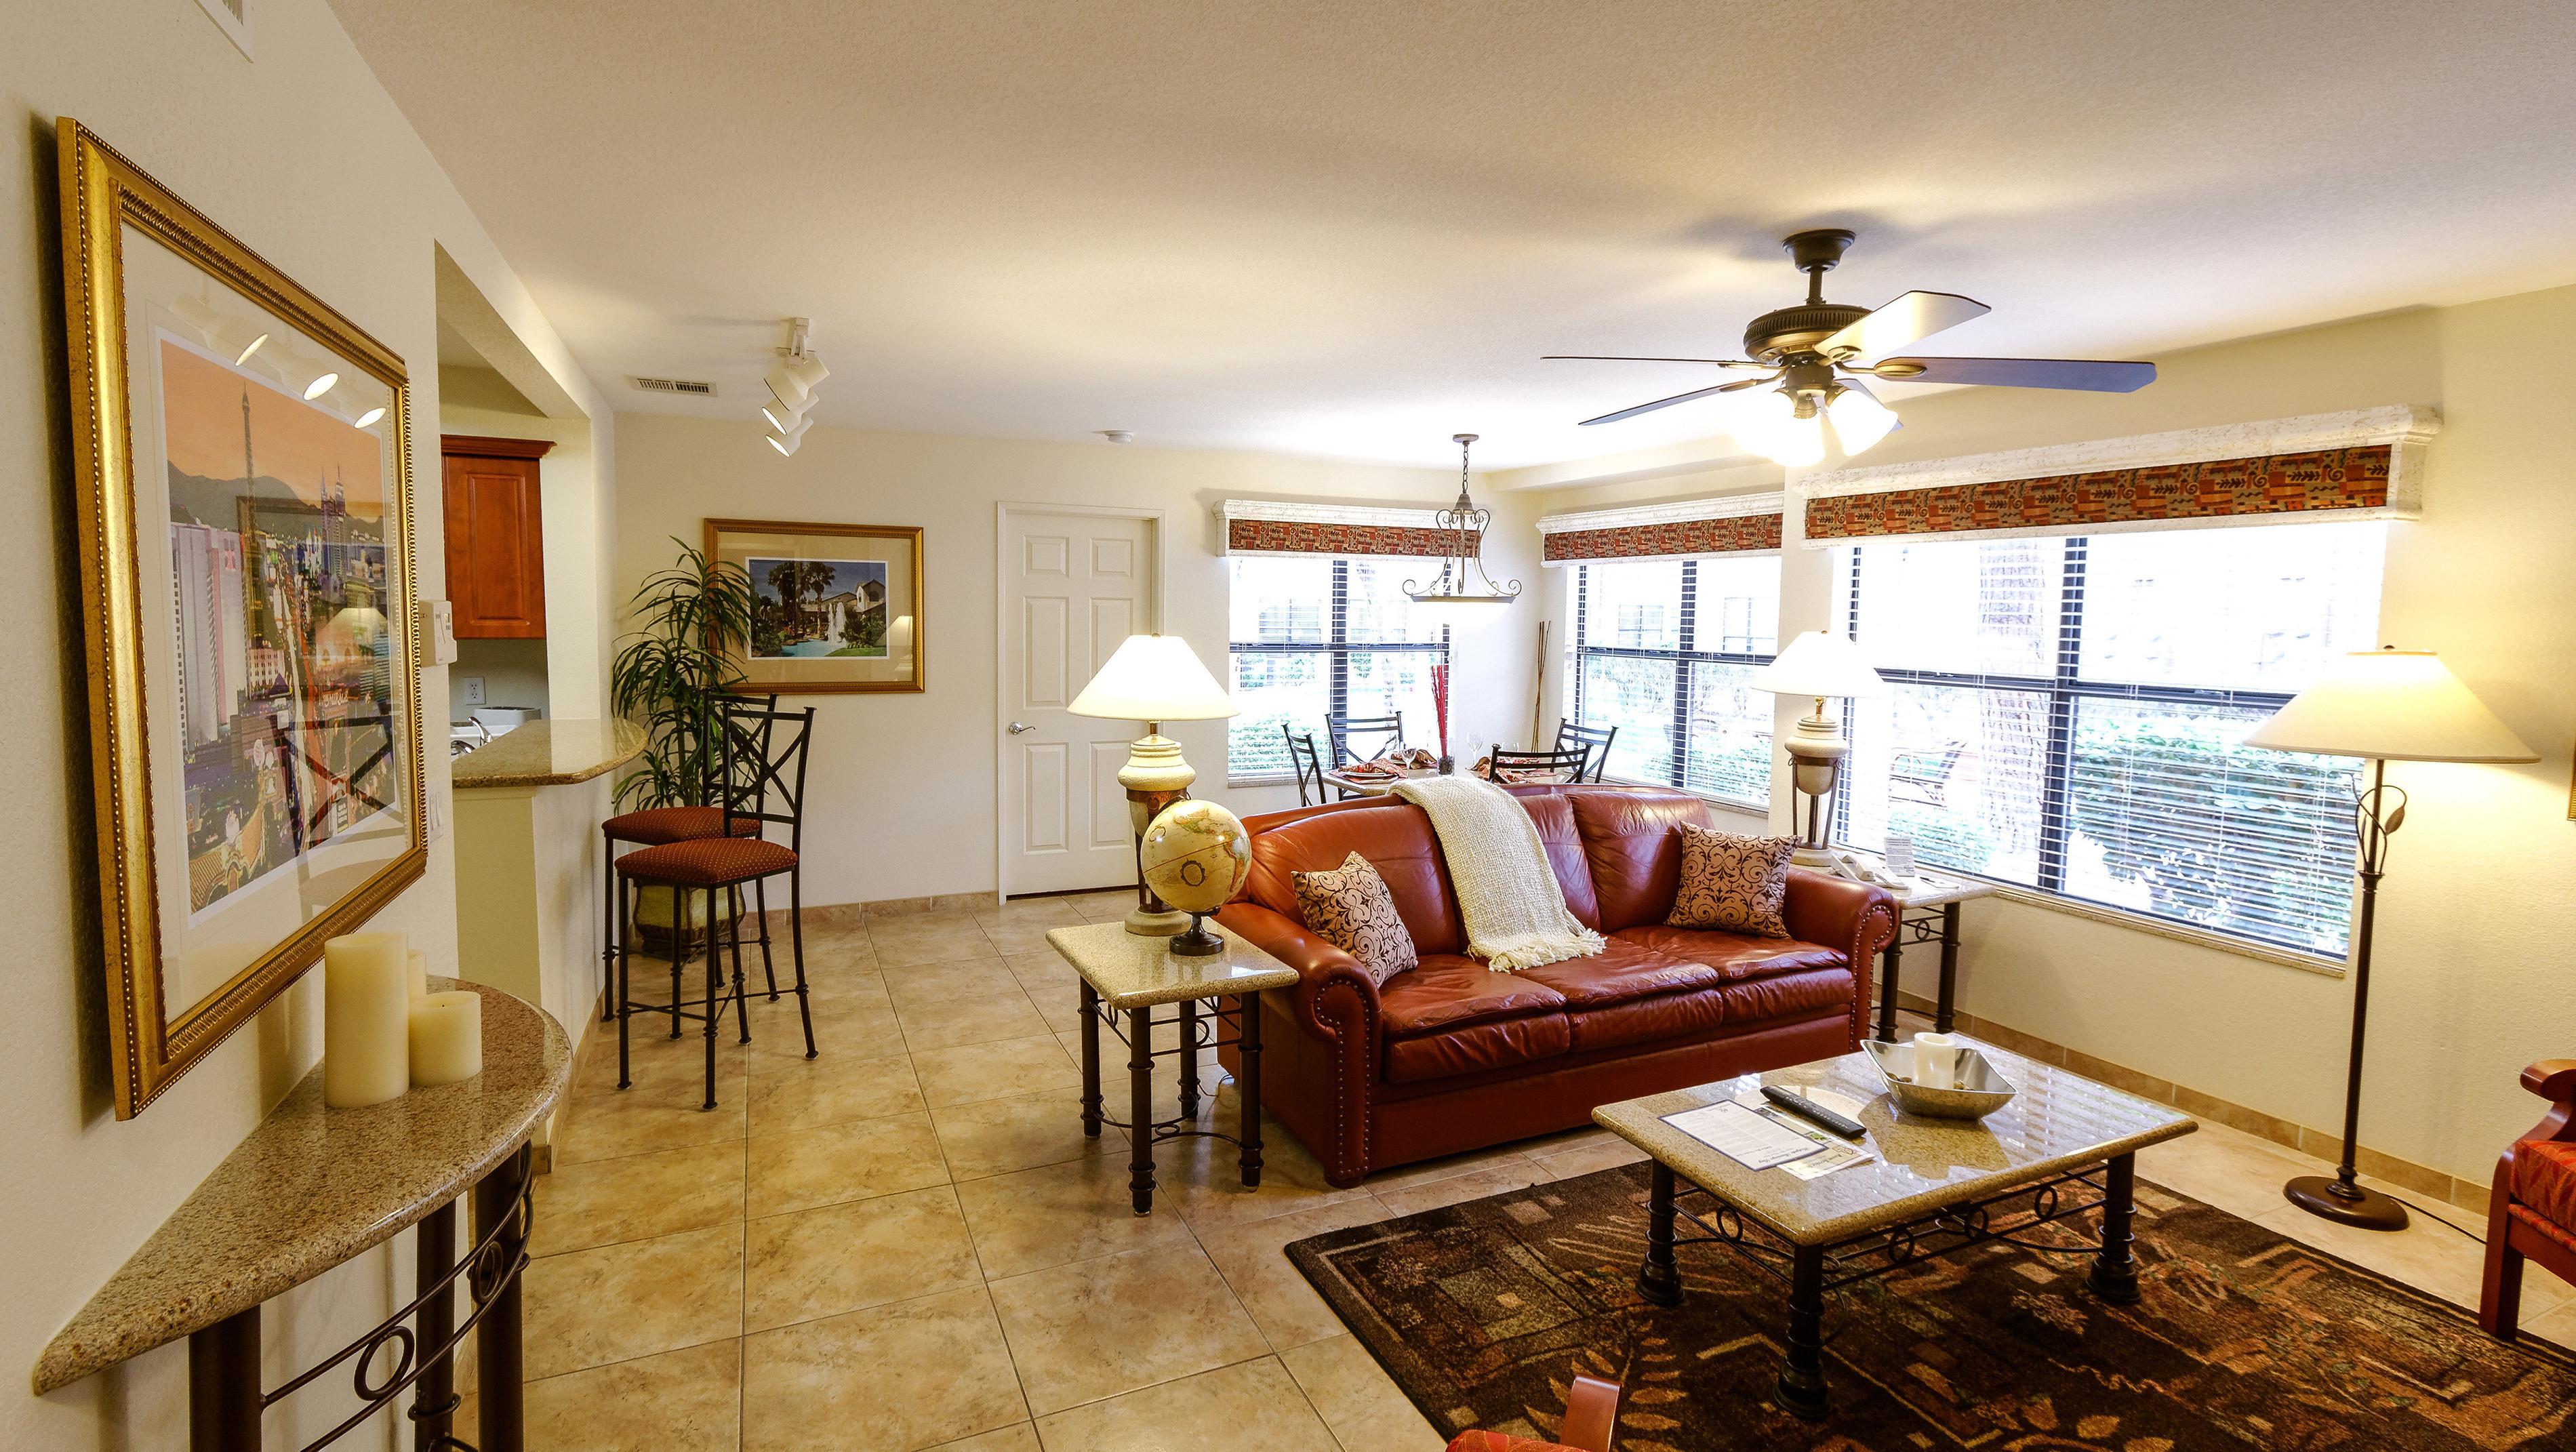 2 Bedroom Suite Las Vegas At Westgate Flamingo Bay Resort